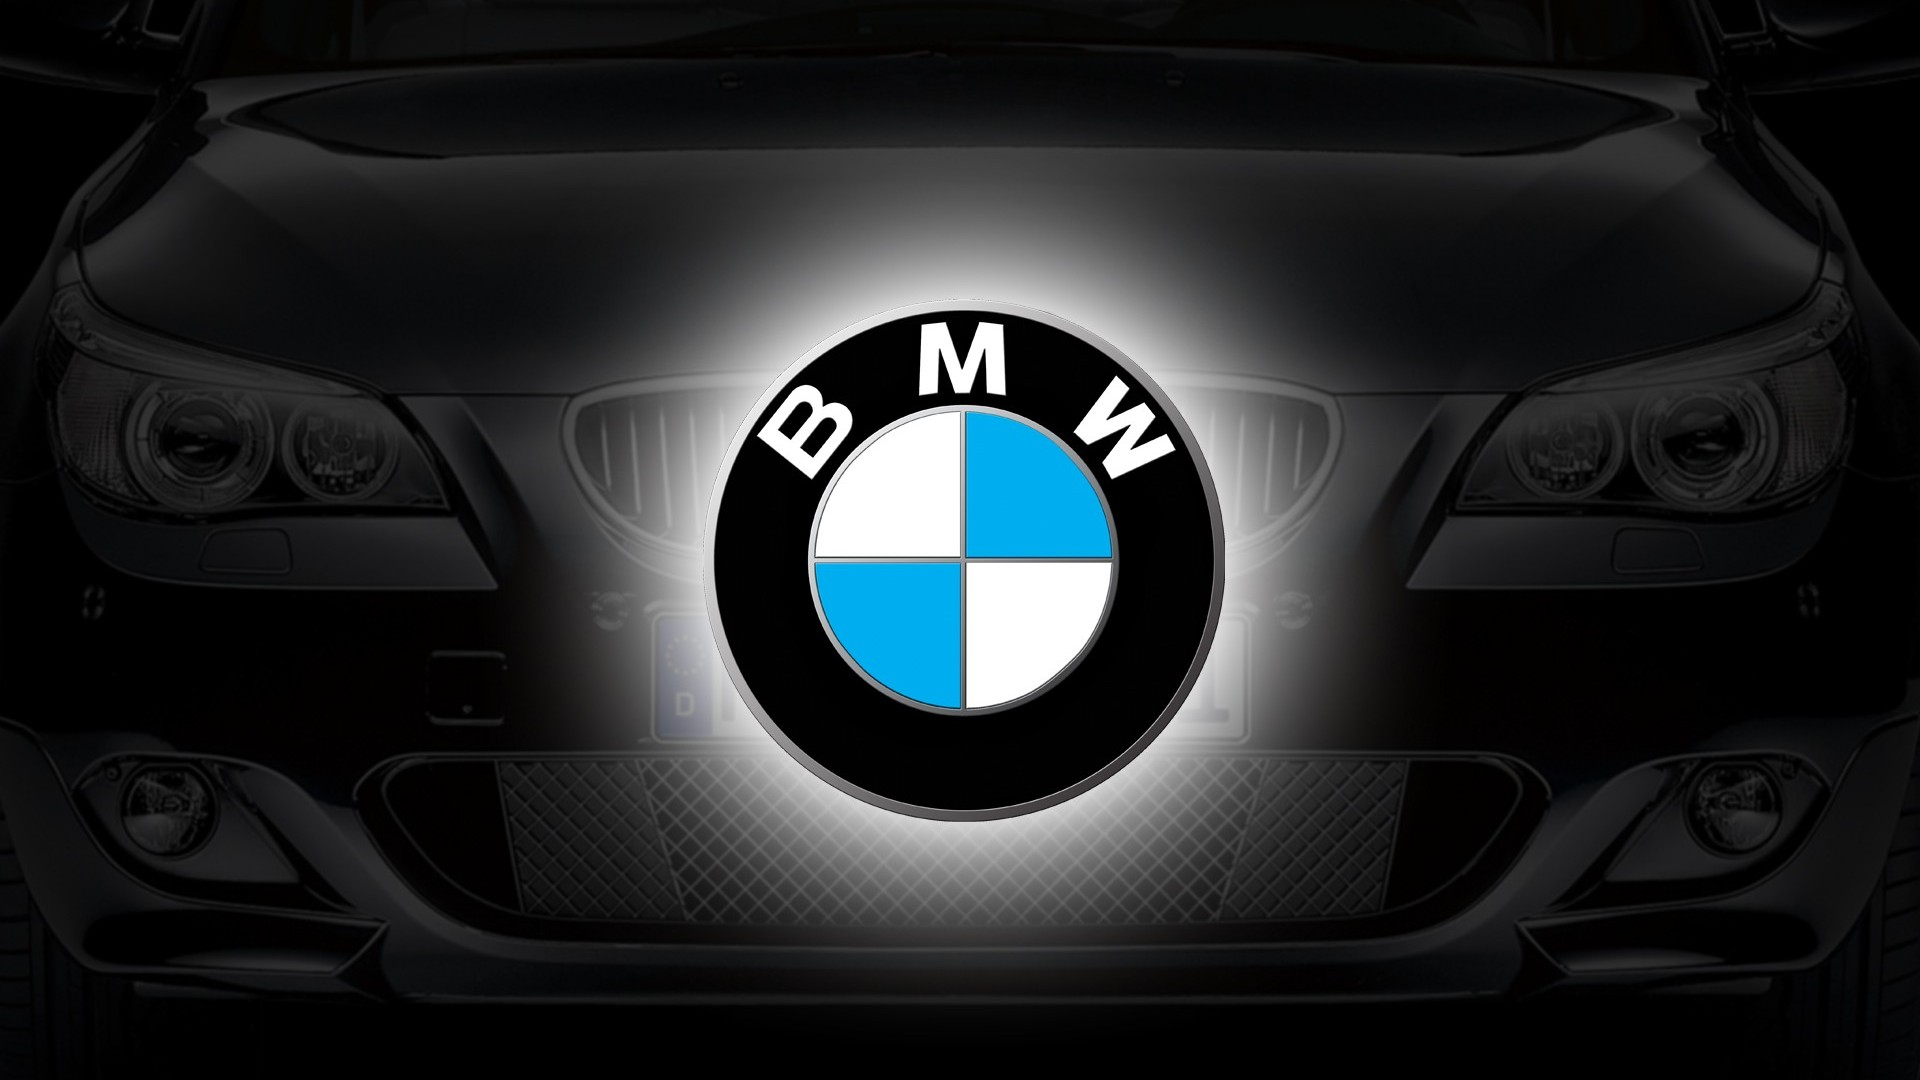 bmw car logo design background hd wallpaper 1920x1080